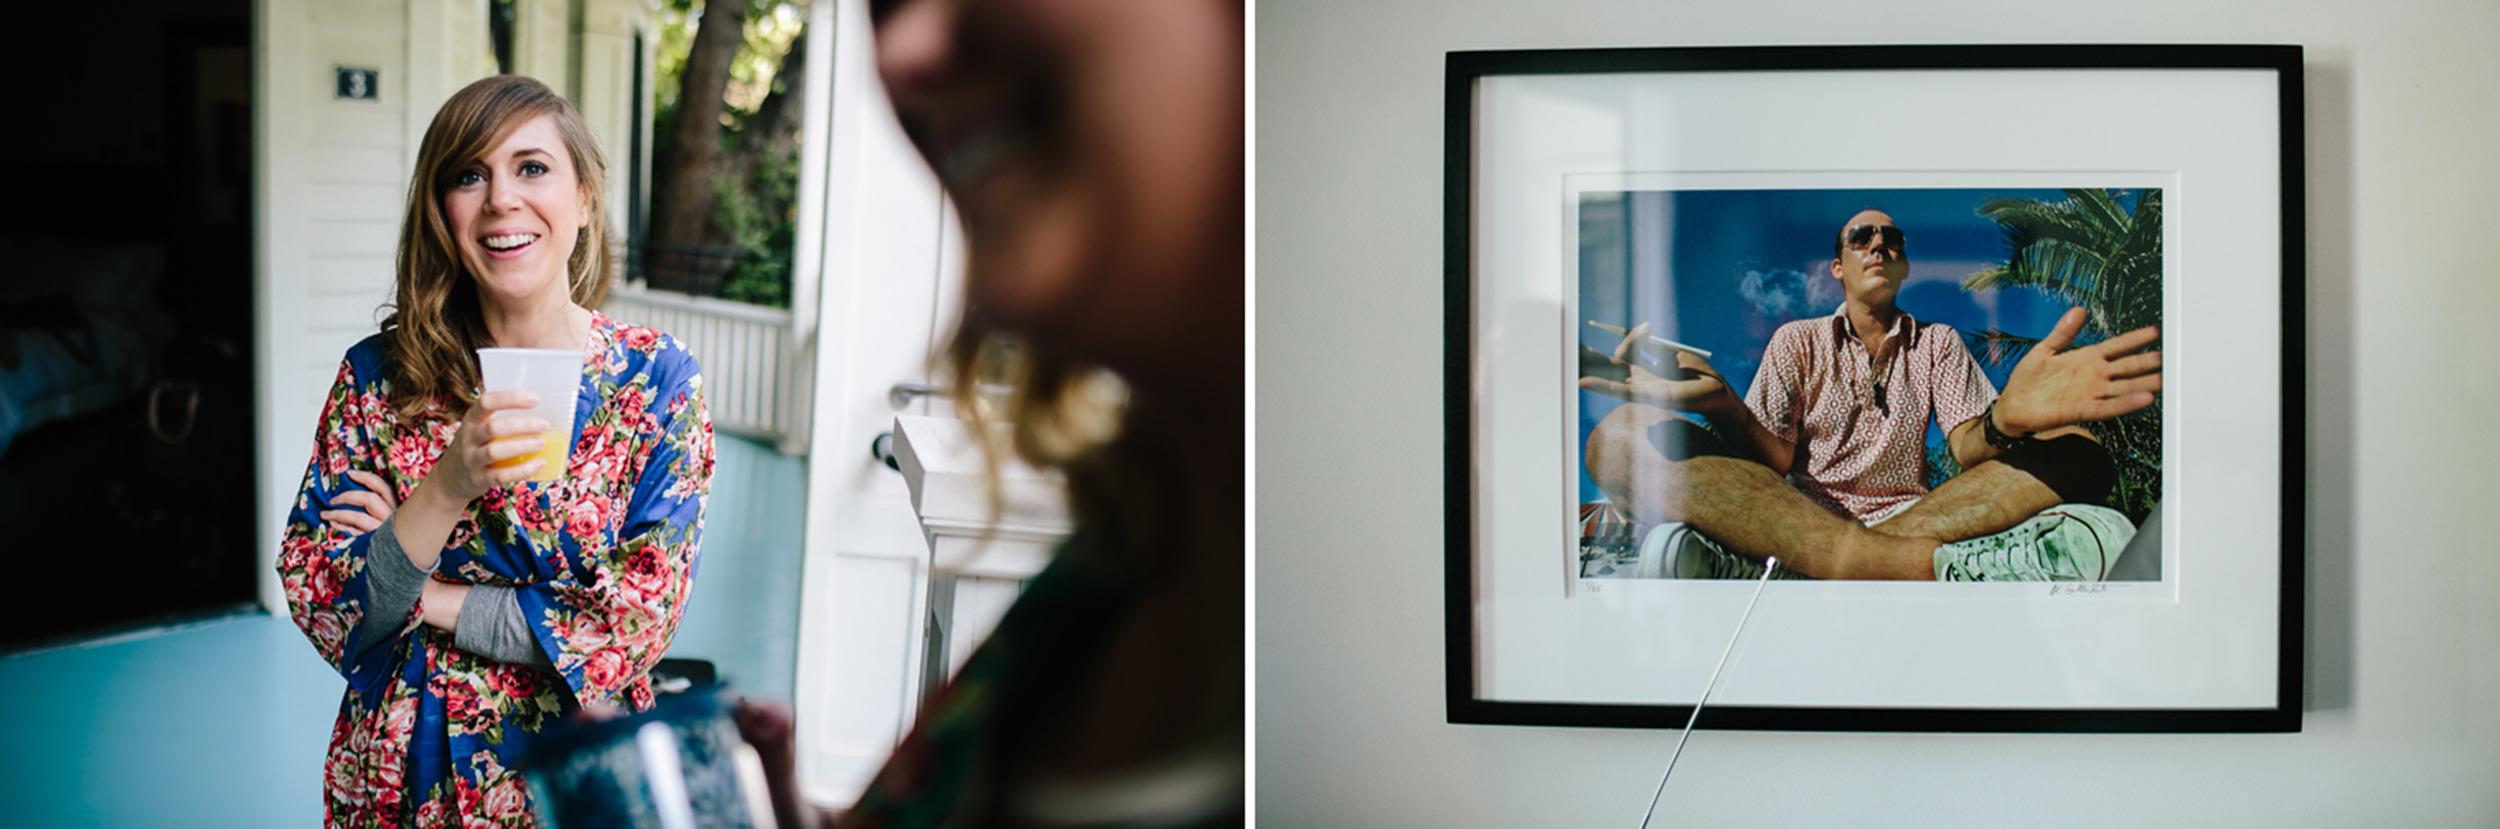 AustinWeddingPhotographer-Mercury-Hall004.jpg